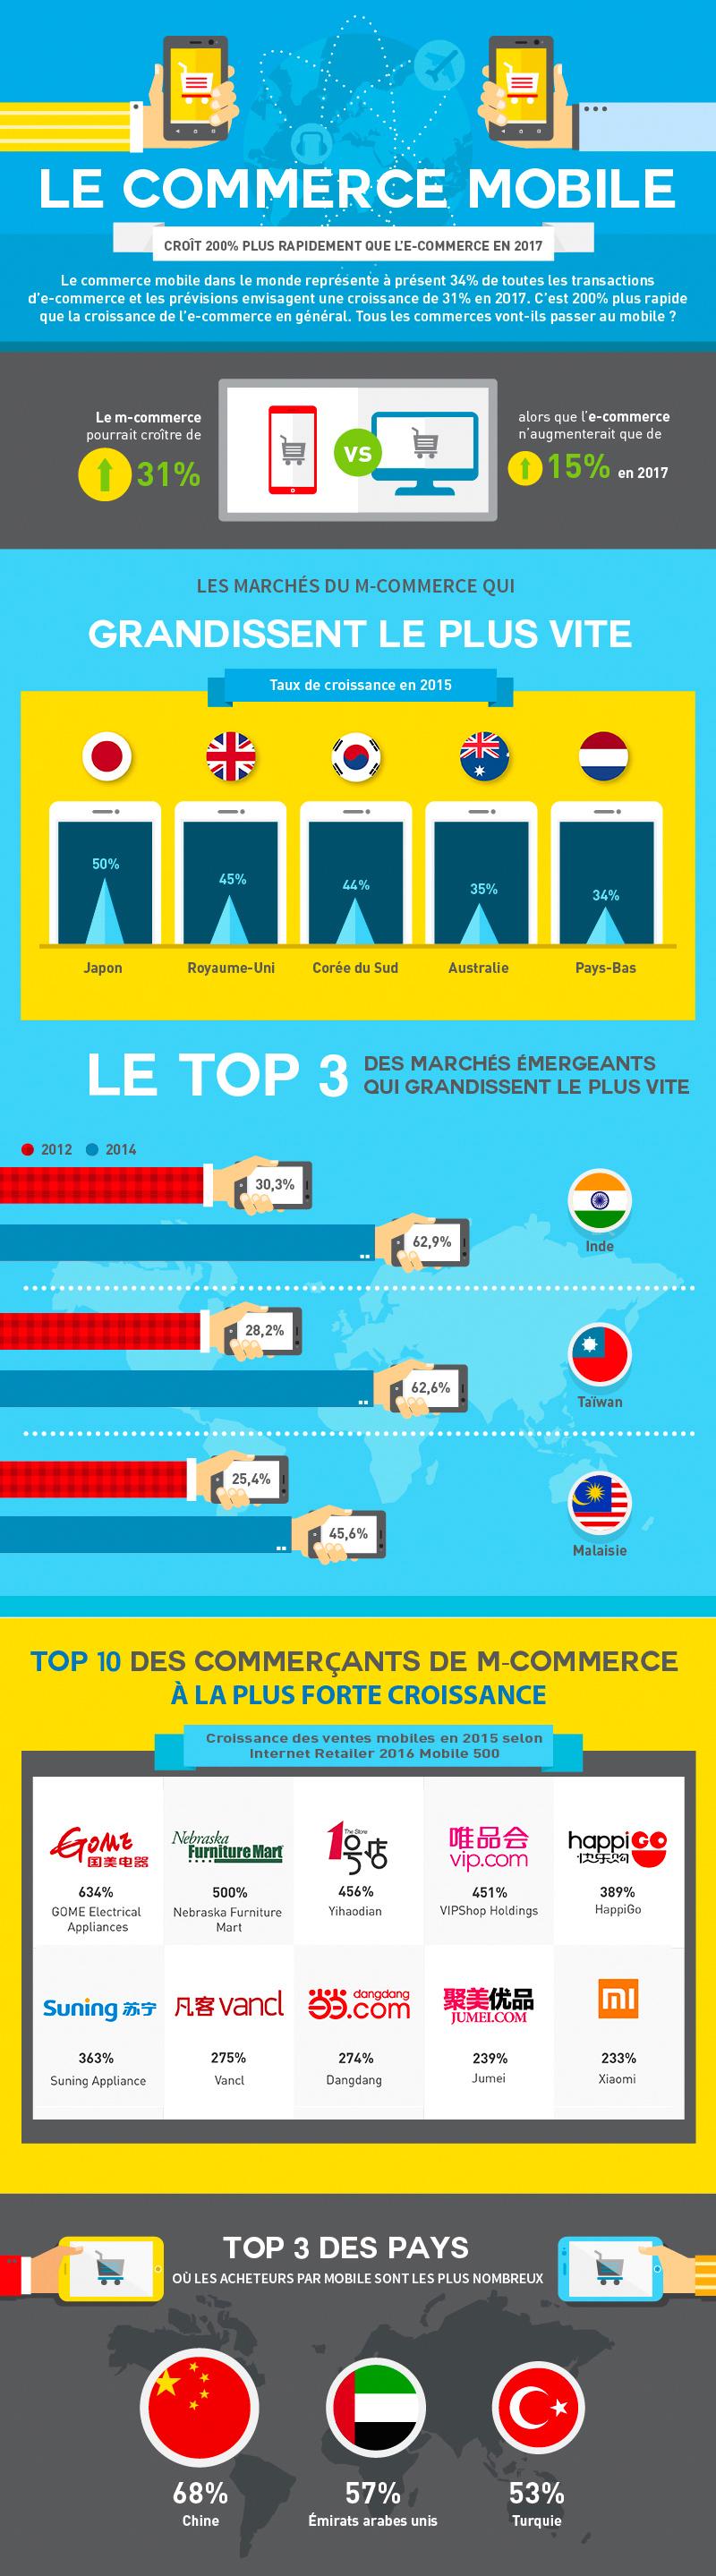 mcommerce-infographie-1